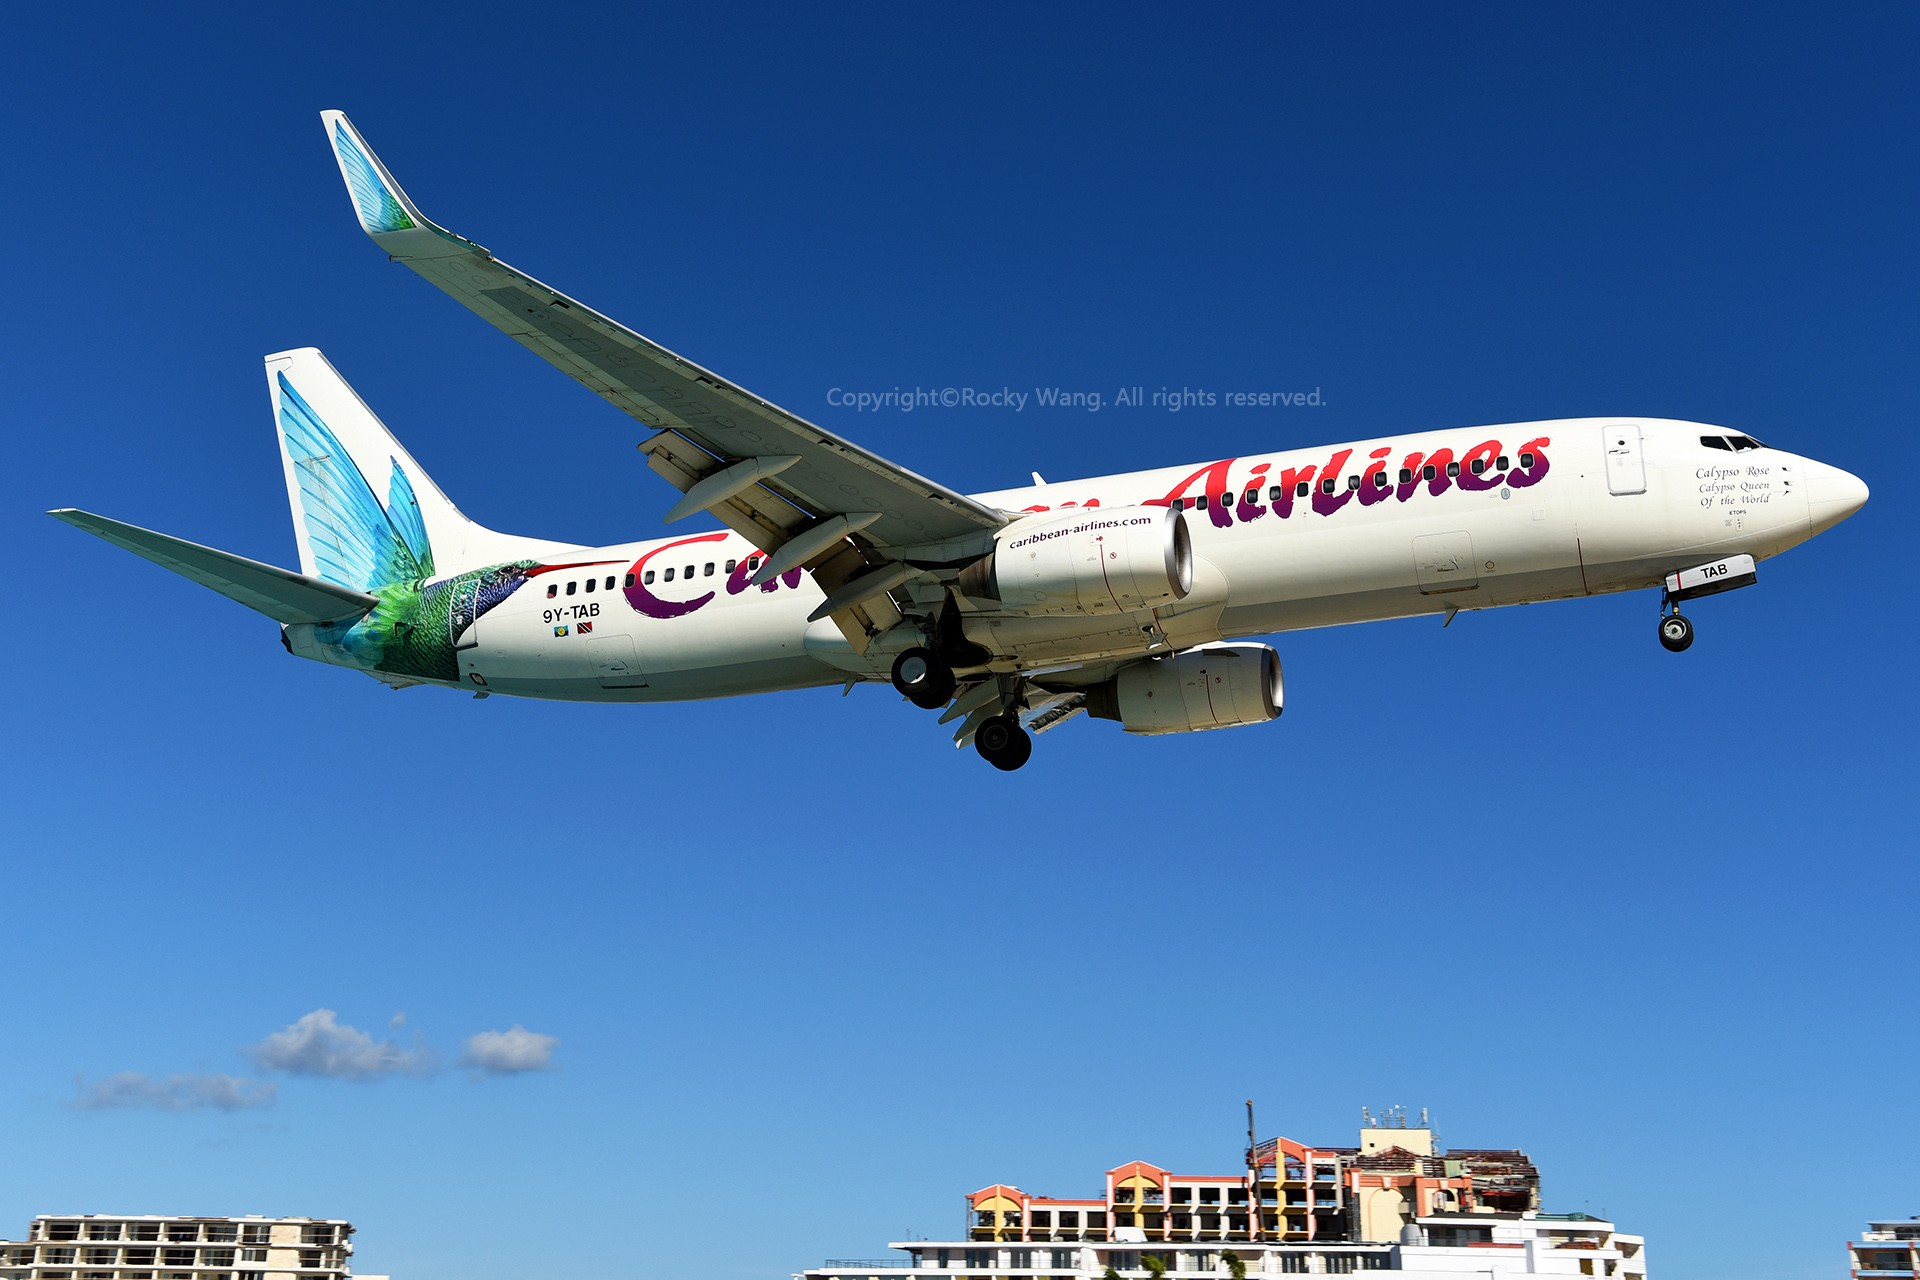 Re:[原创]My endless Caribbean dream——圣马丁朱莉安娜公主机场拍机记 BOEING 737-8Q8 9Y-TAB 荷属安的列斯群岛朱利安娜公主机场